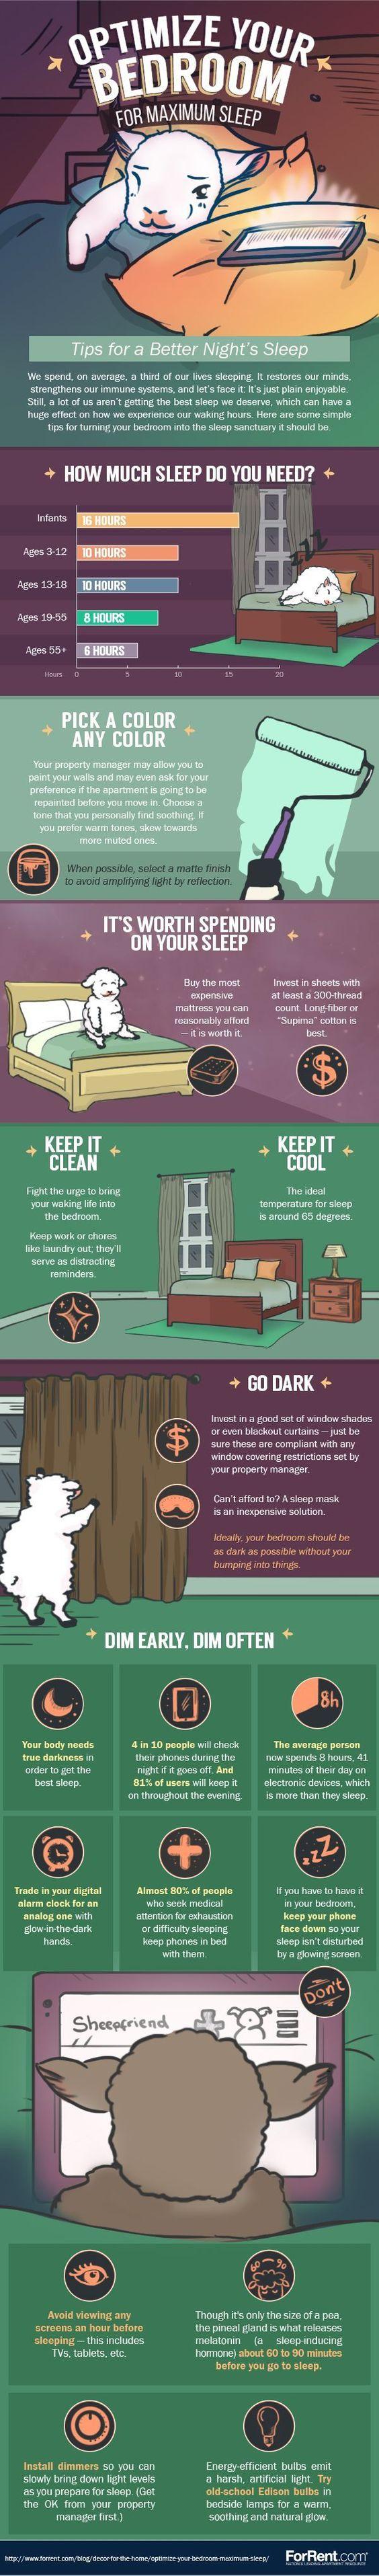 7 Ways to Maximize Your Beauty Sleep